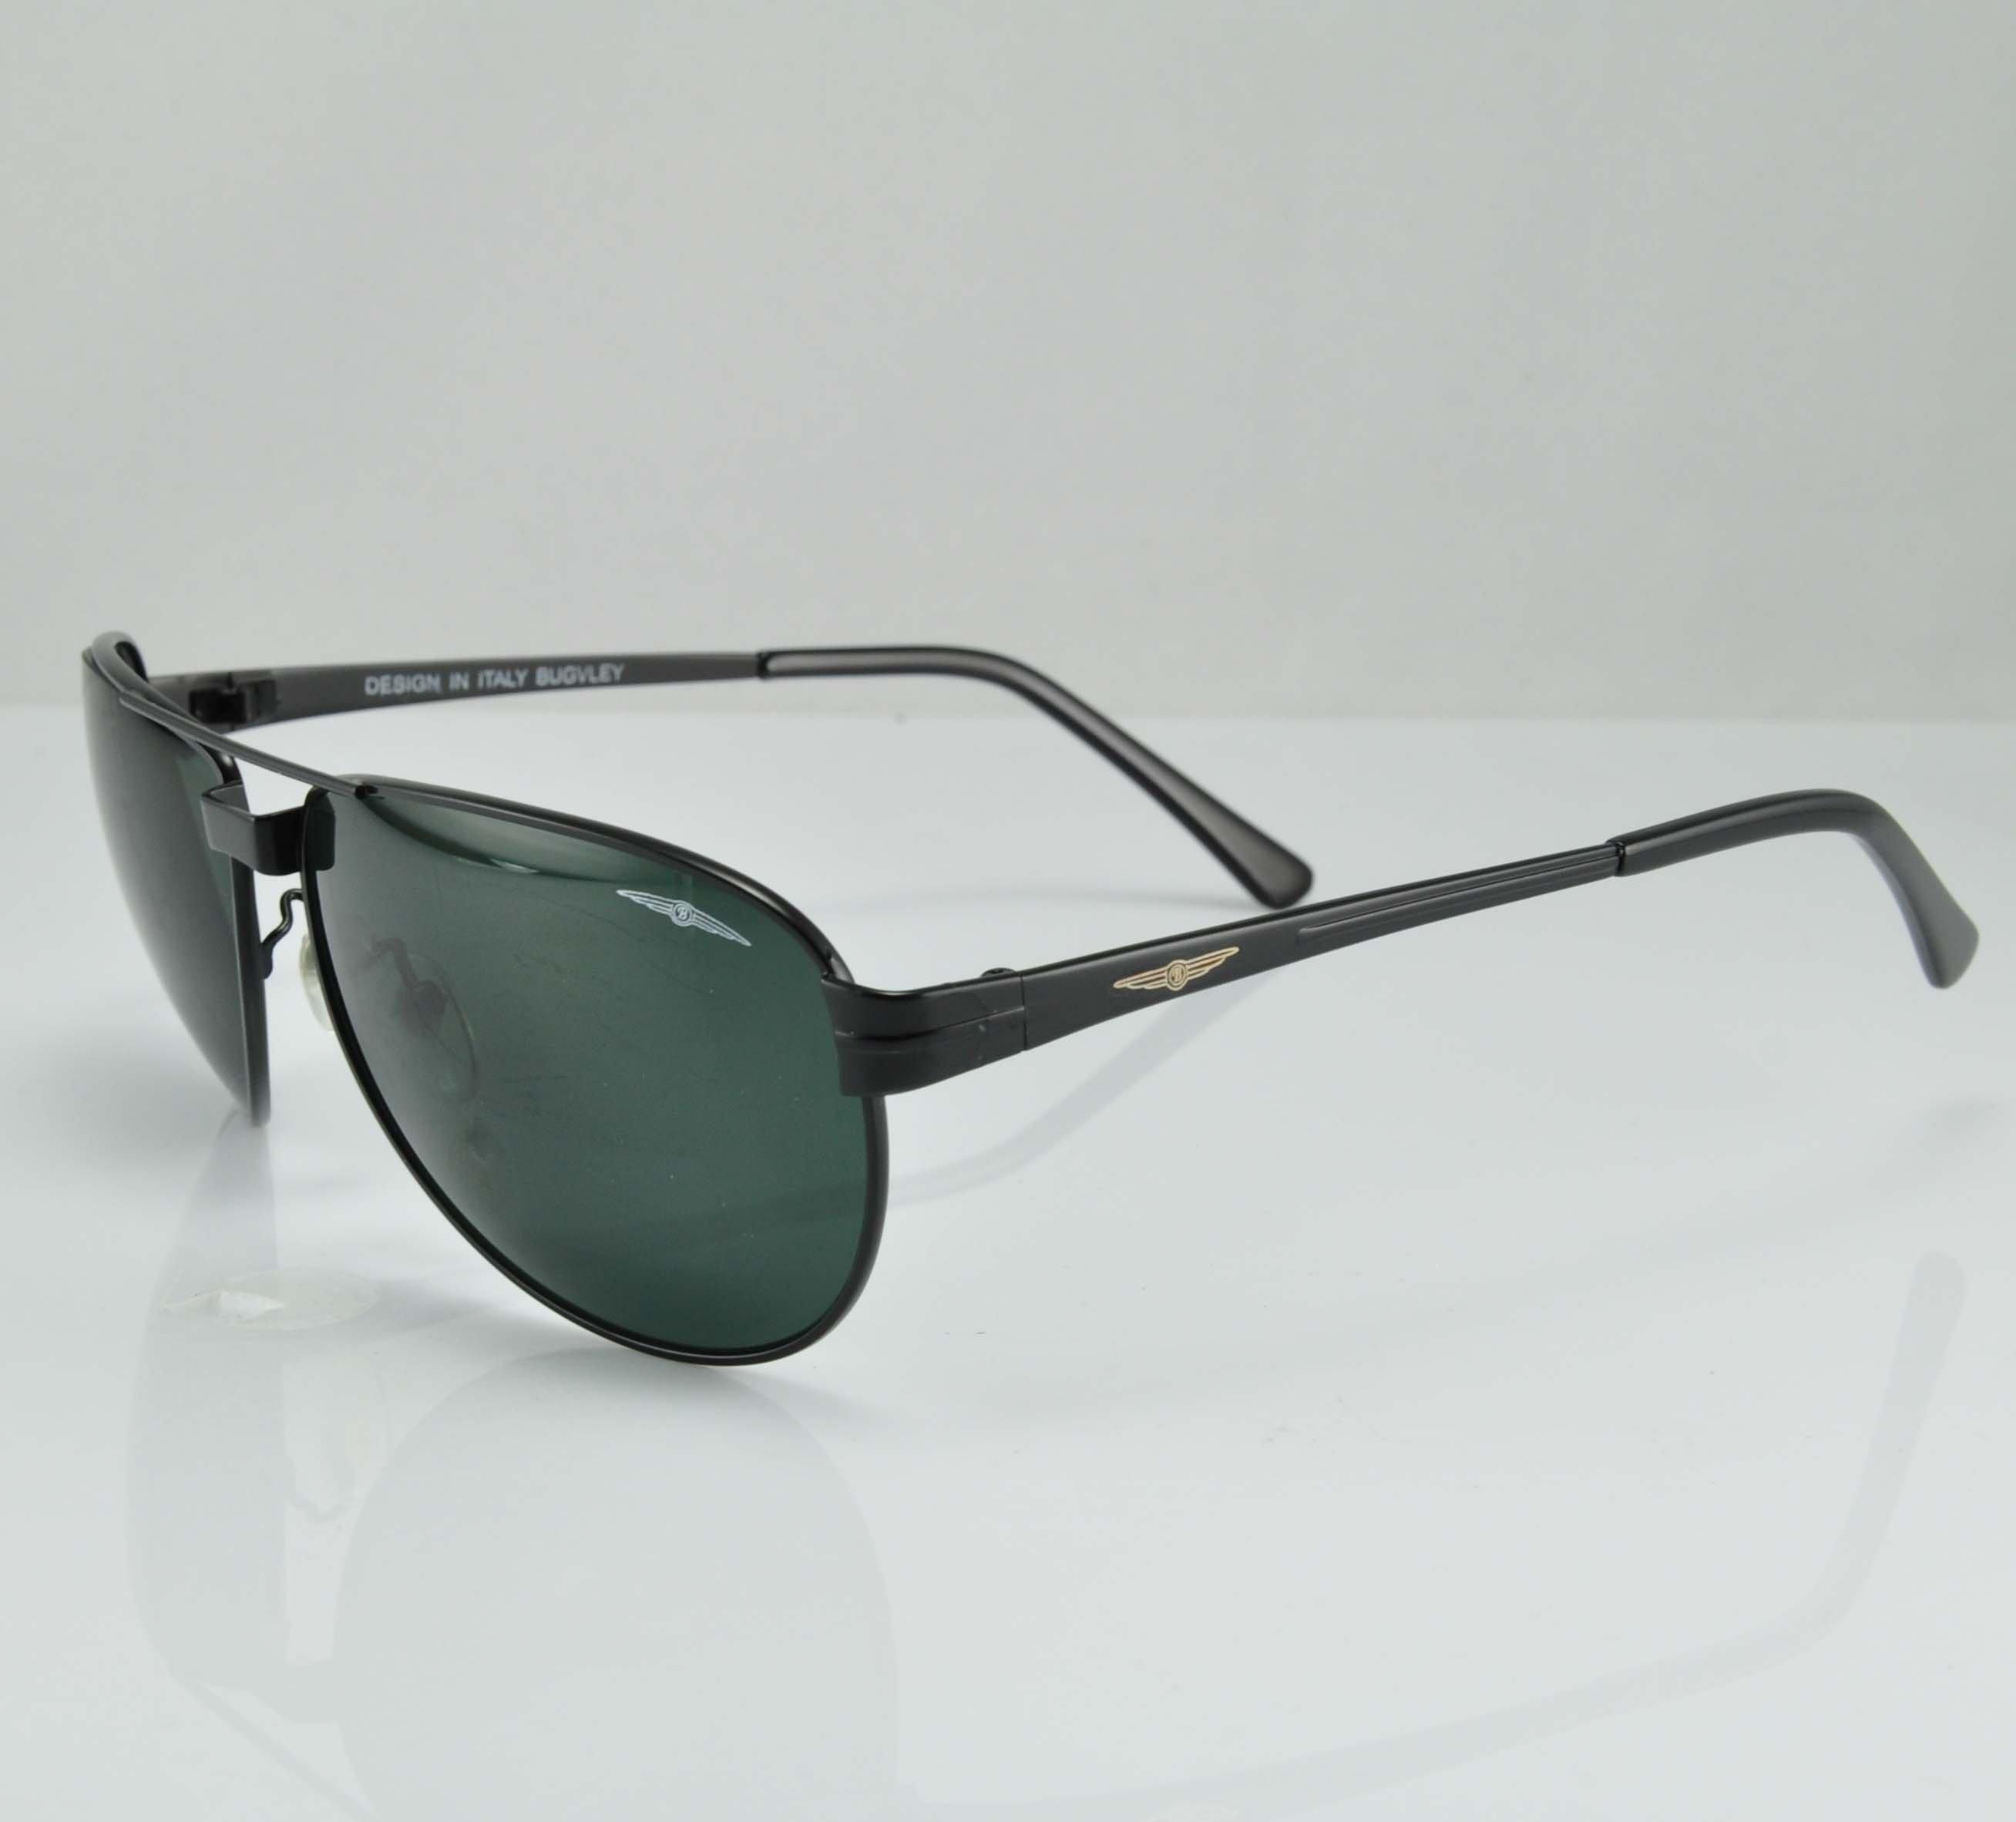 Glasses Frames High End : High End Eyewear Promotion-Online Shopping for Promotional ...